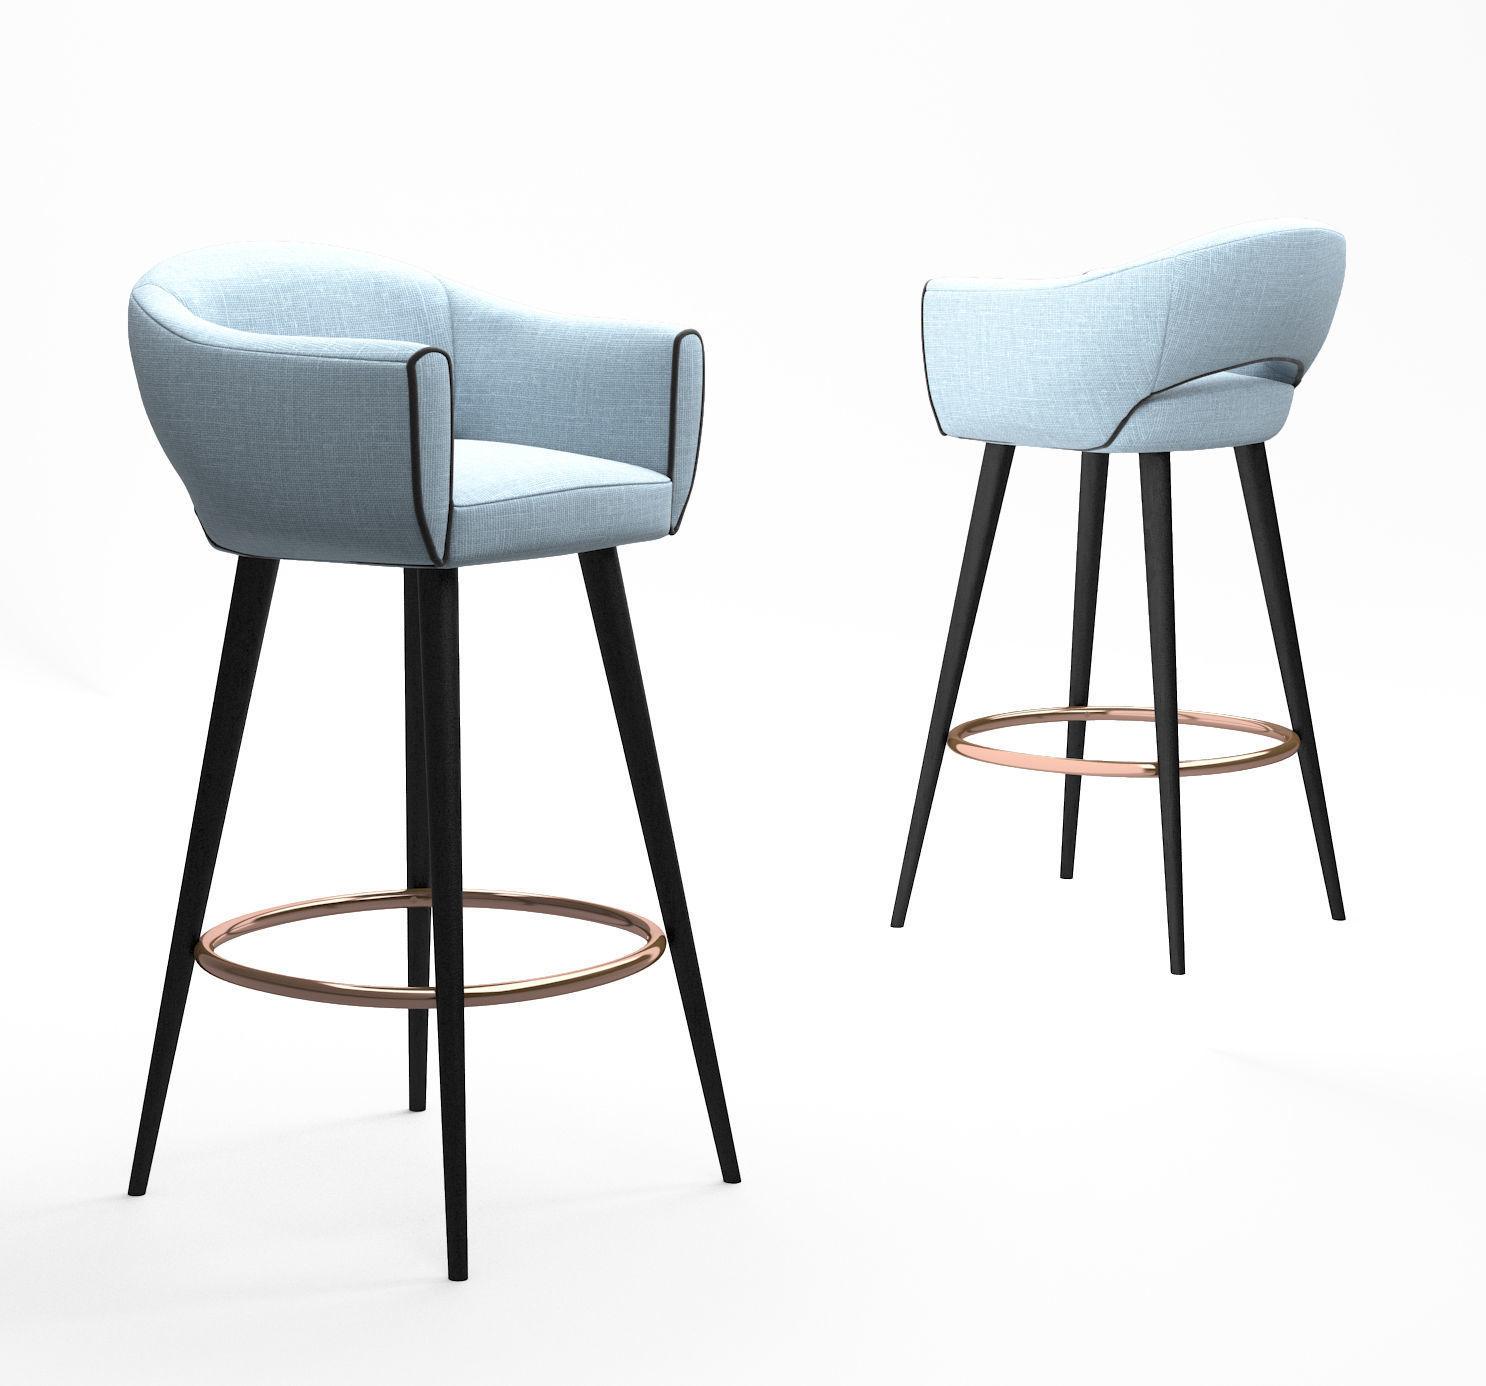 Outstanding Mambo Unlimited Ideas Grace Bar Chair 3D Model Machost Co Dining Chair Design Ideas Machostcouk